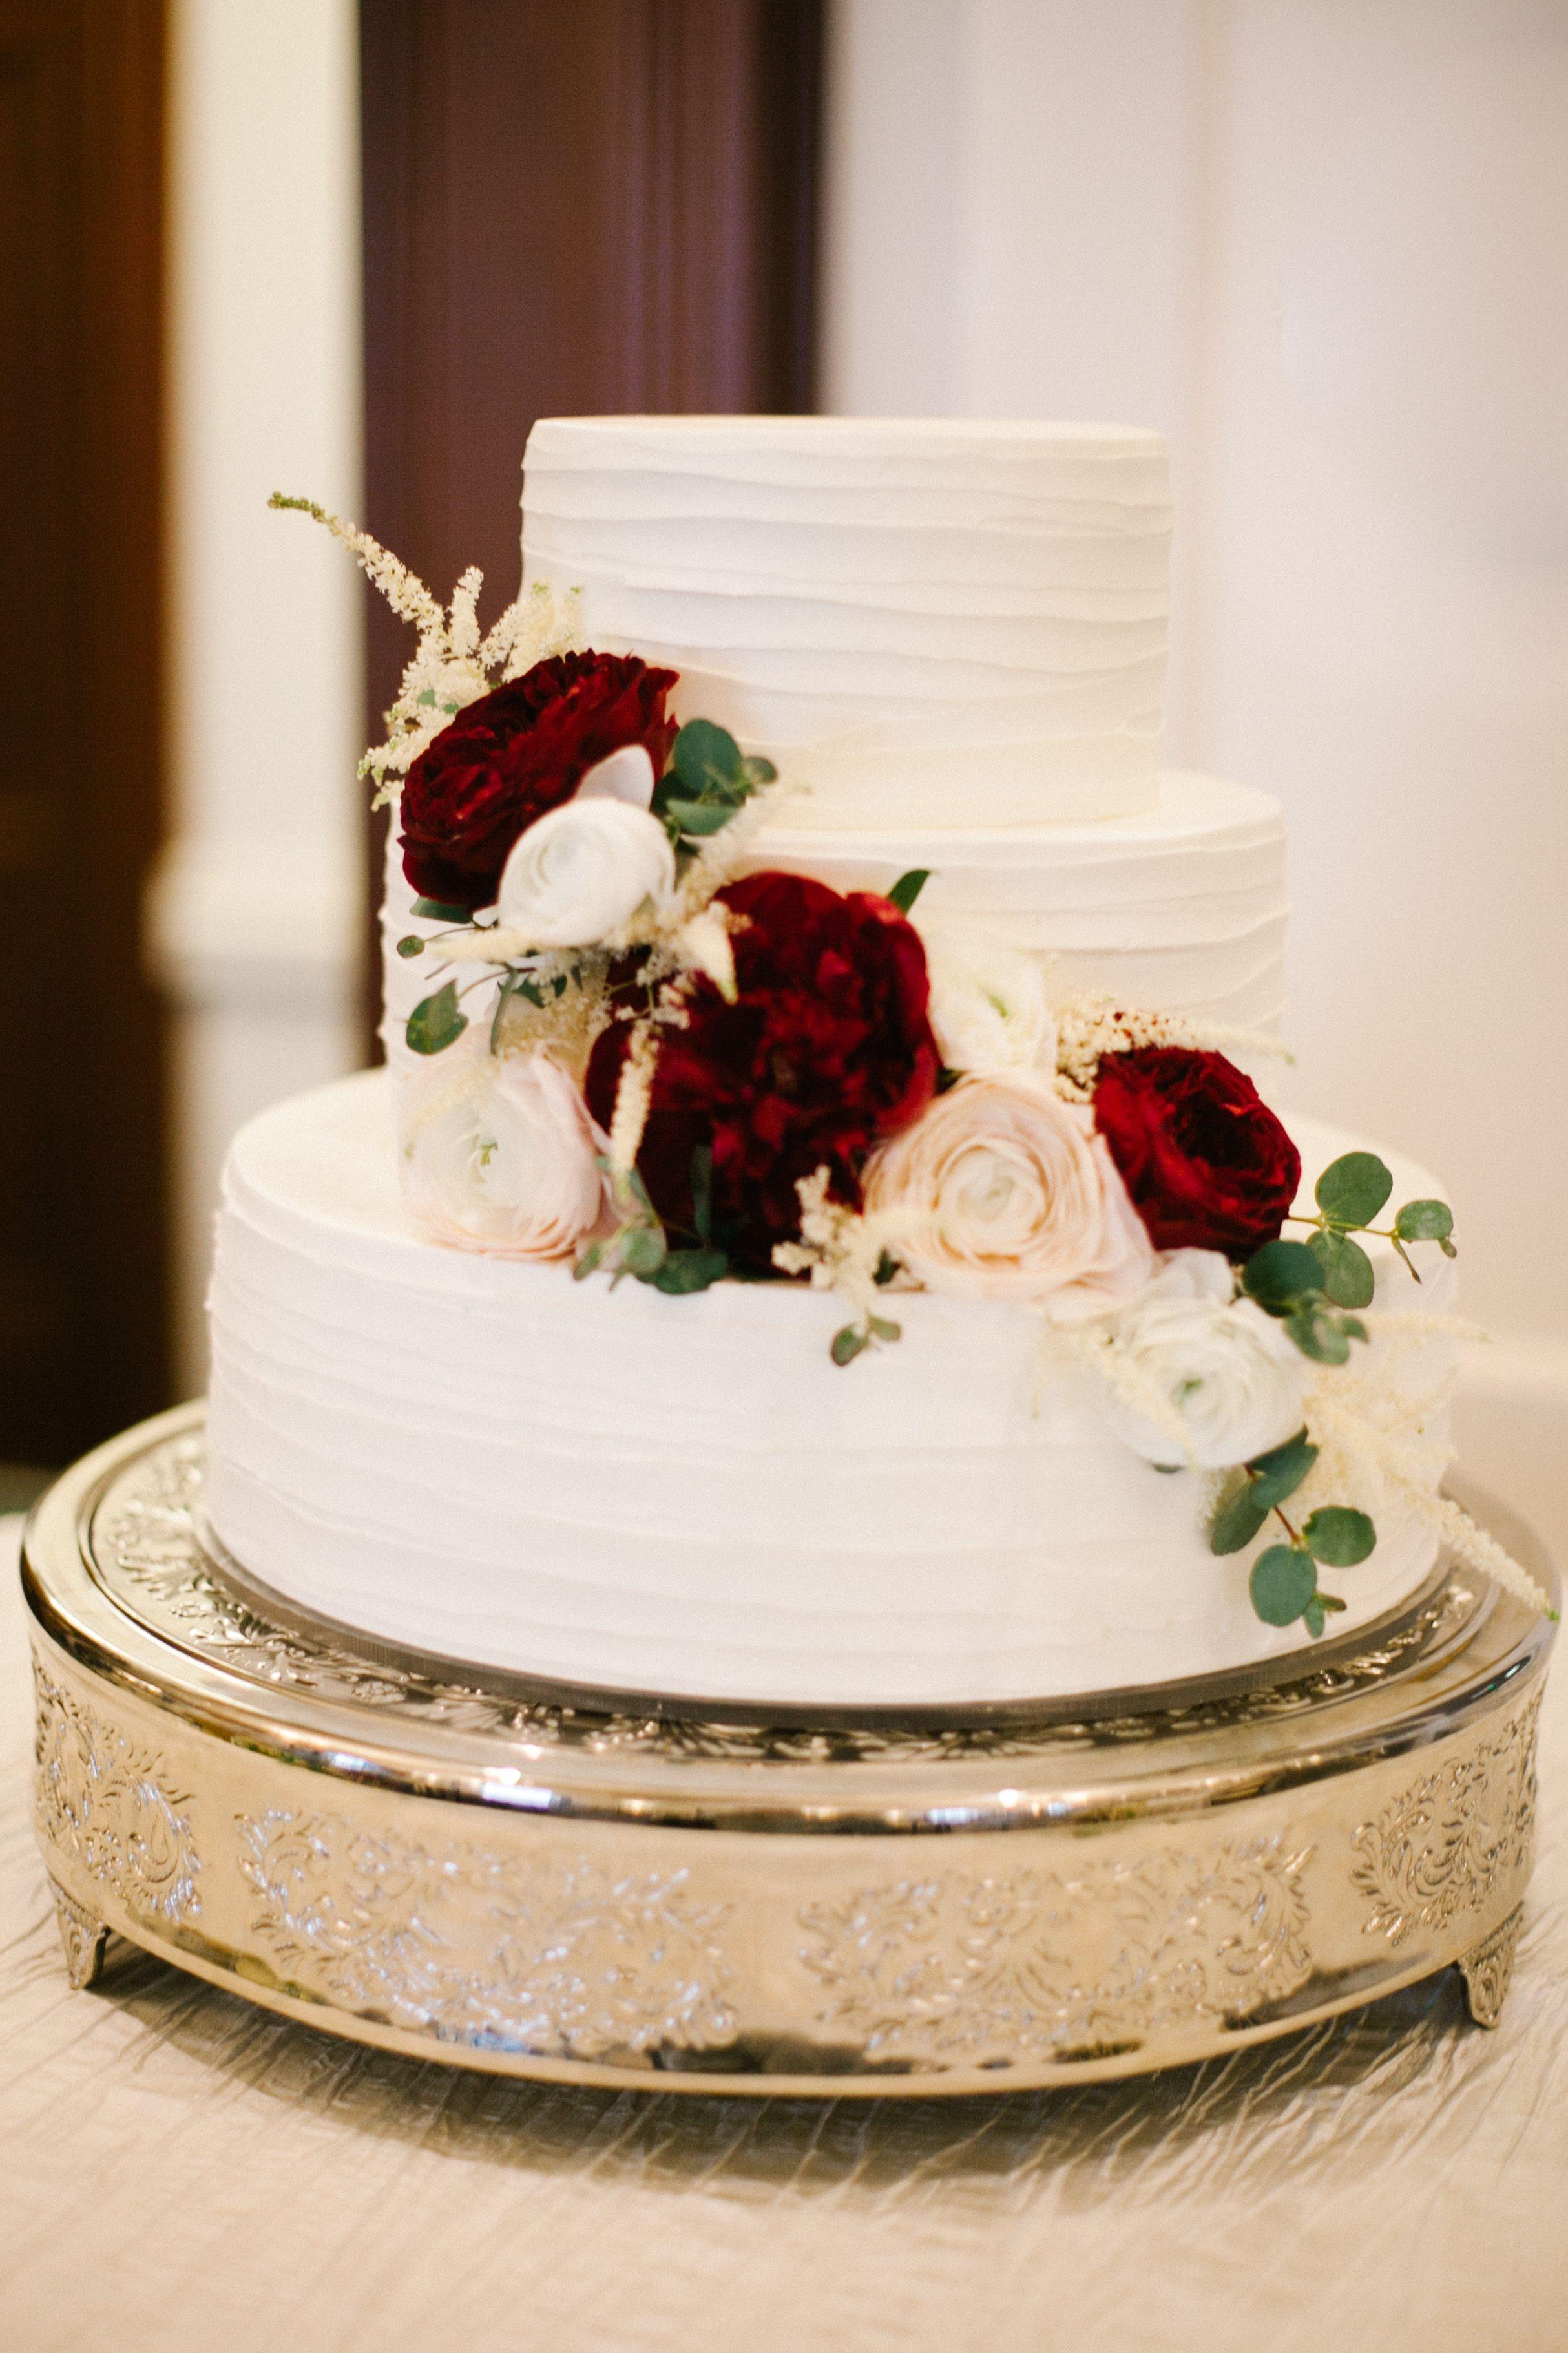 Wedding Cakes Pictures Pinterest  Pinterest alex ramey Wedding cake with flowers Marsala